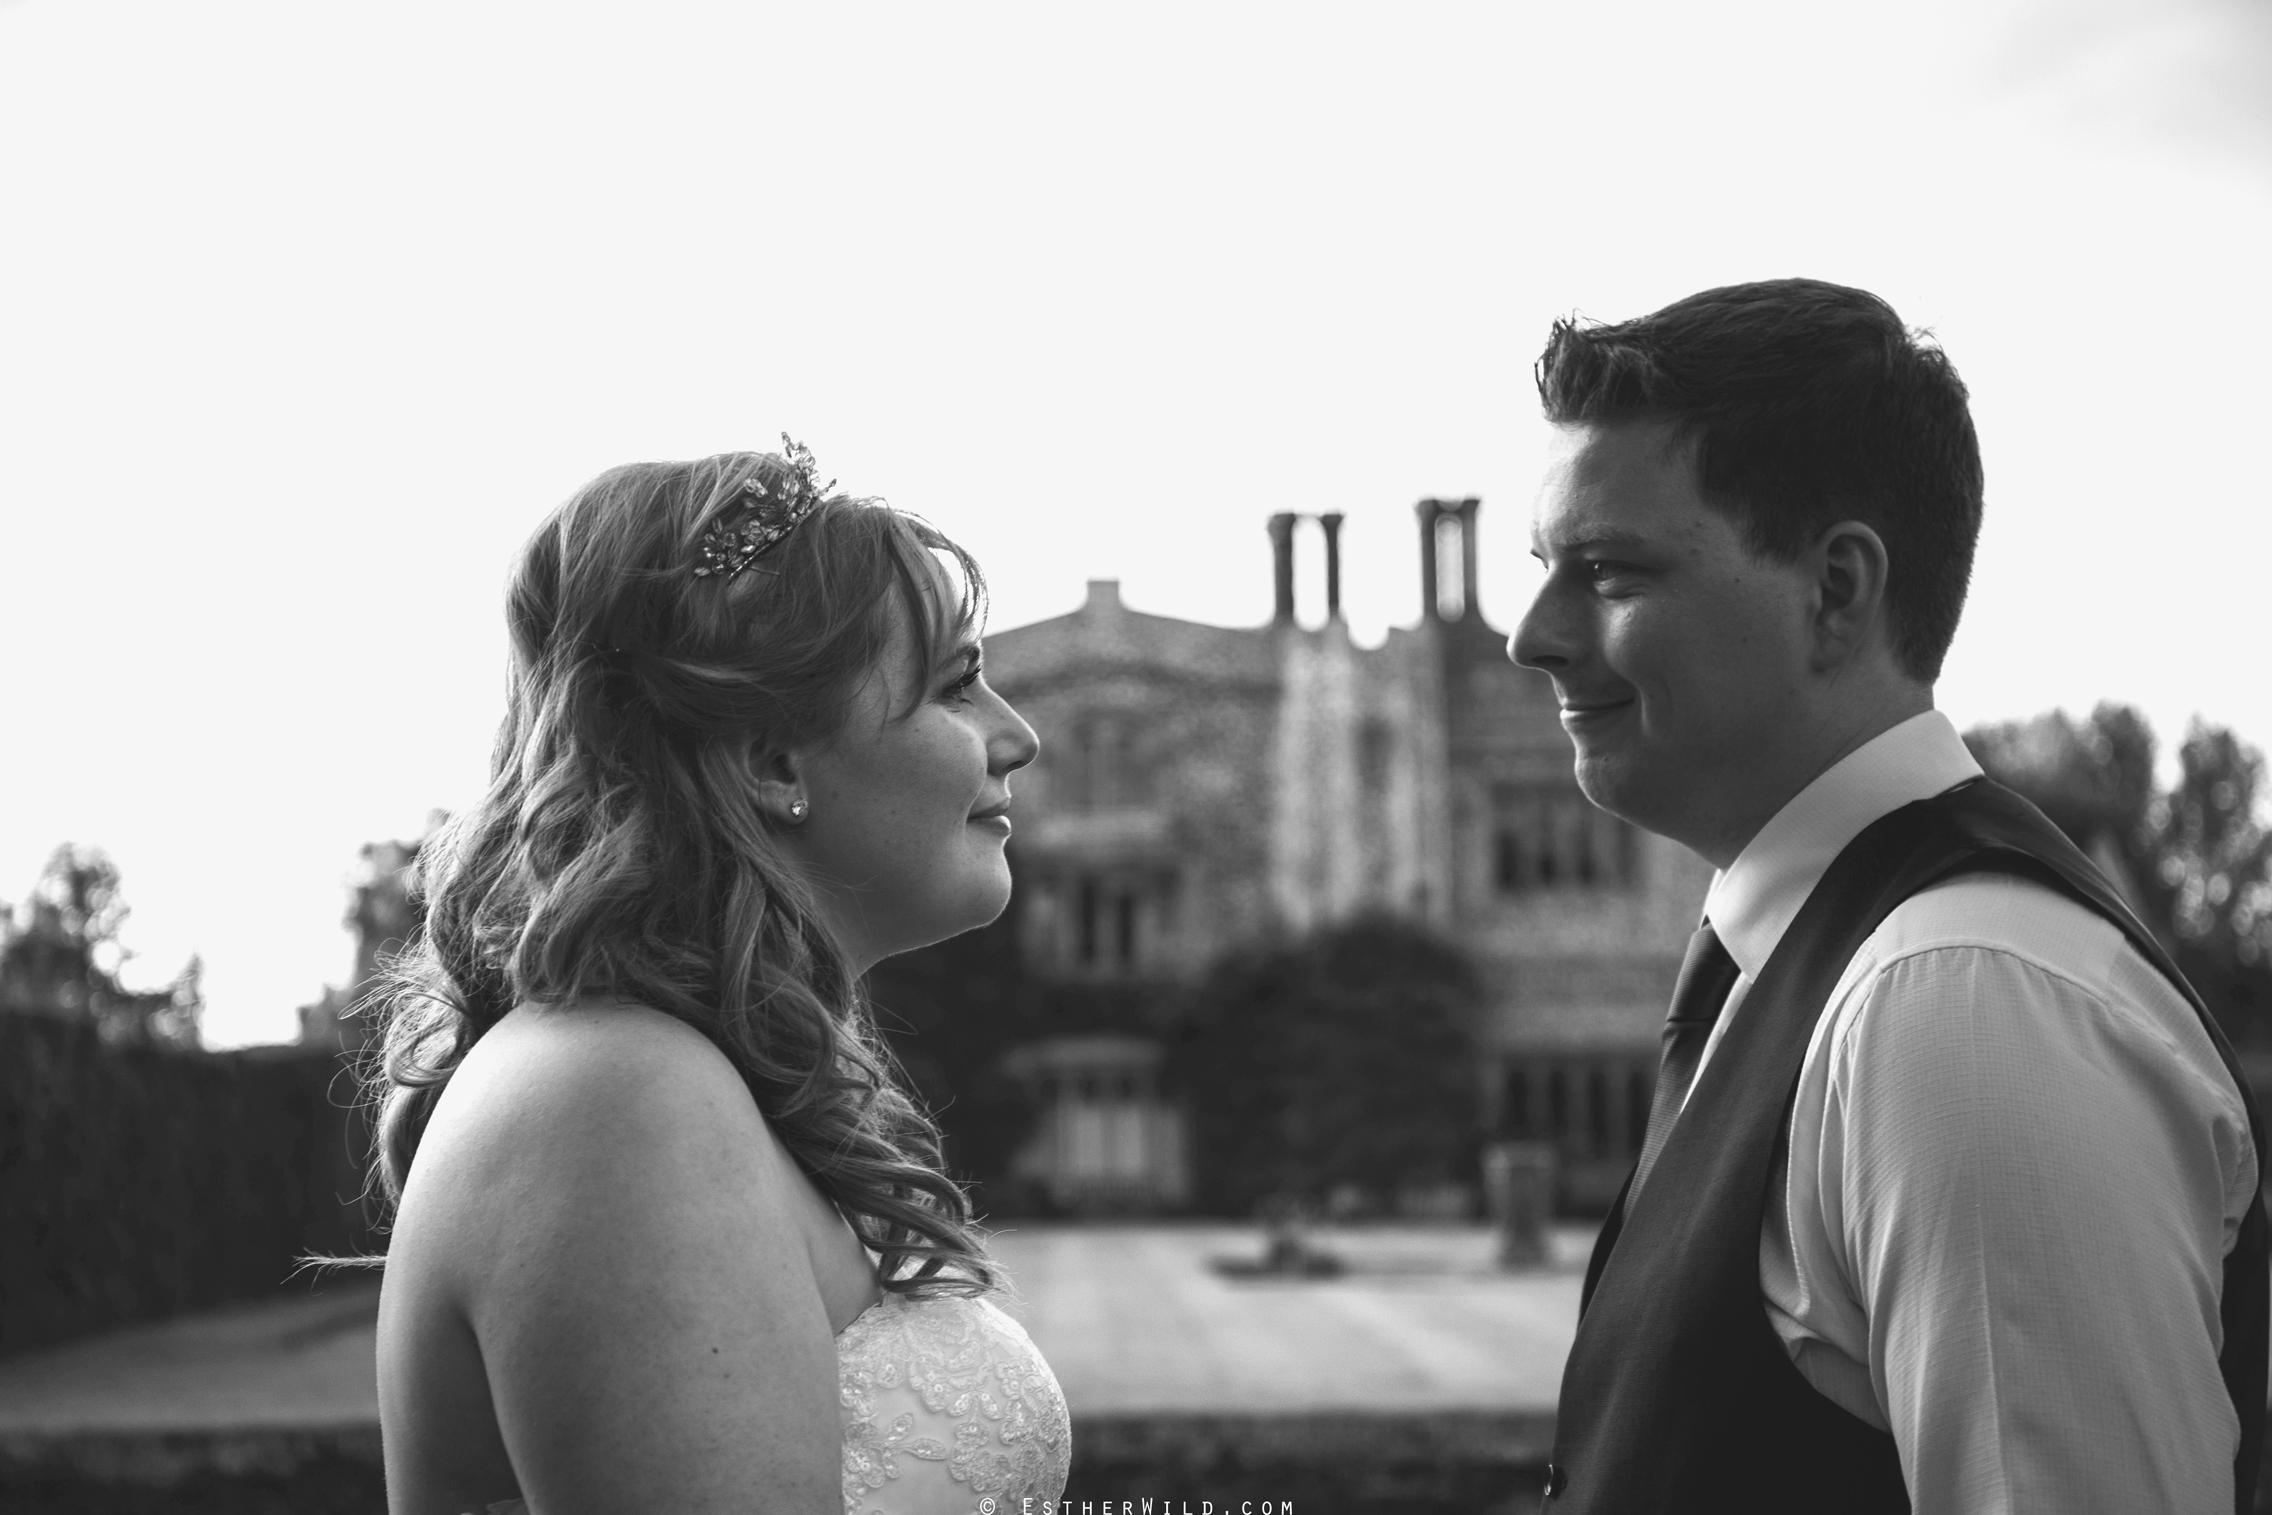 Norfolk_Wedding_Photographer_Mannington_Hall_Country_Esther_Wild_2566-1.jpg